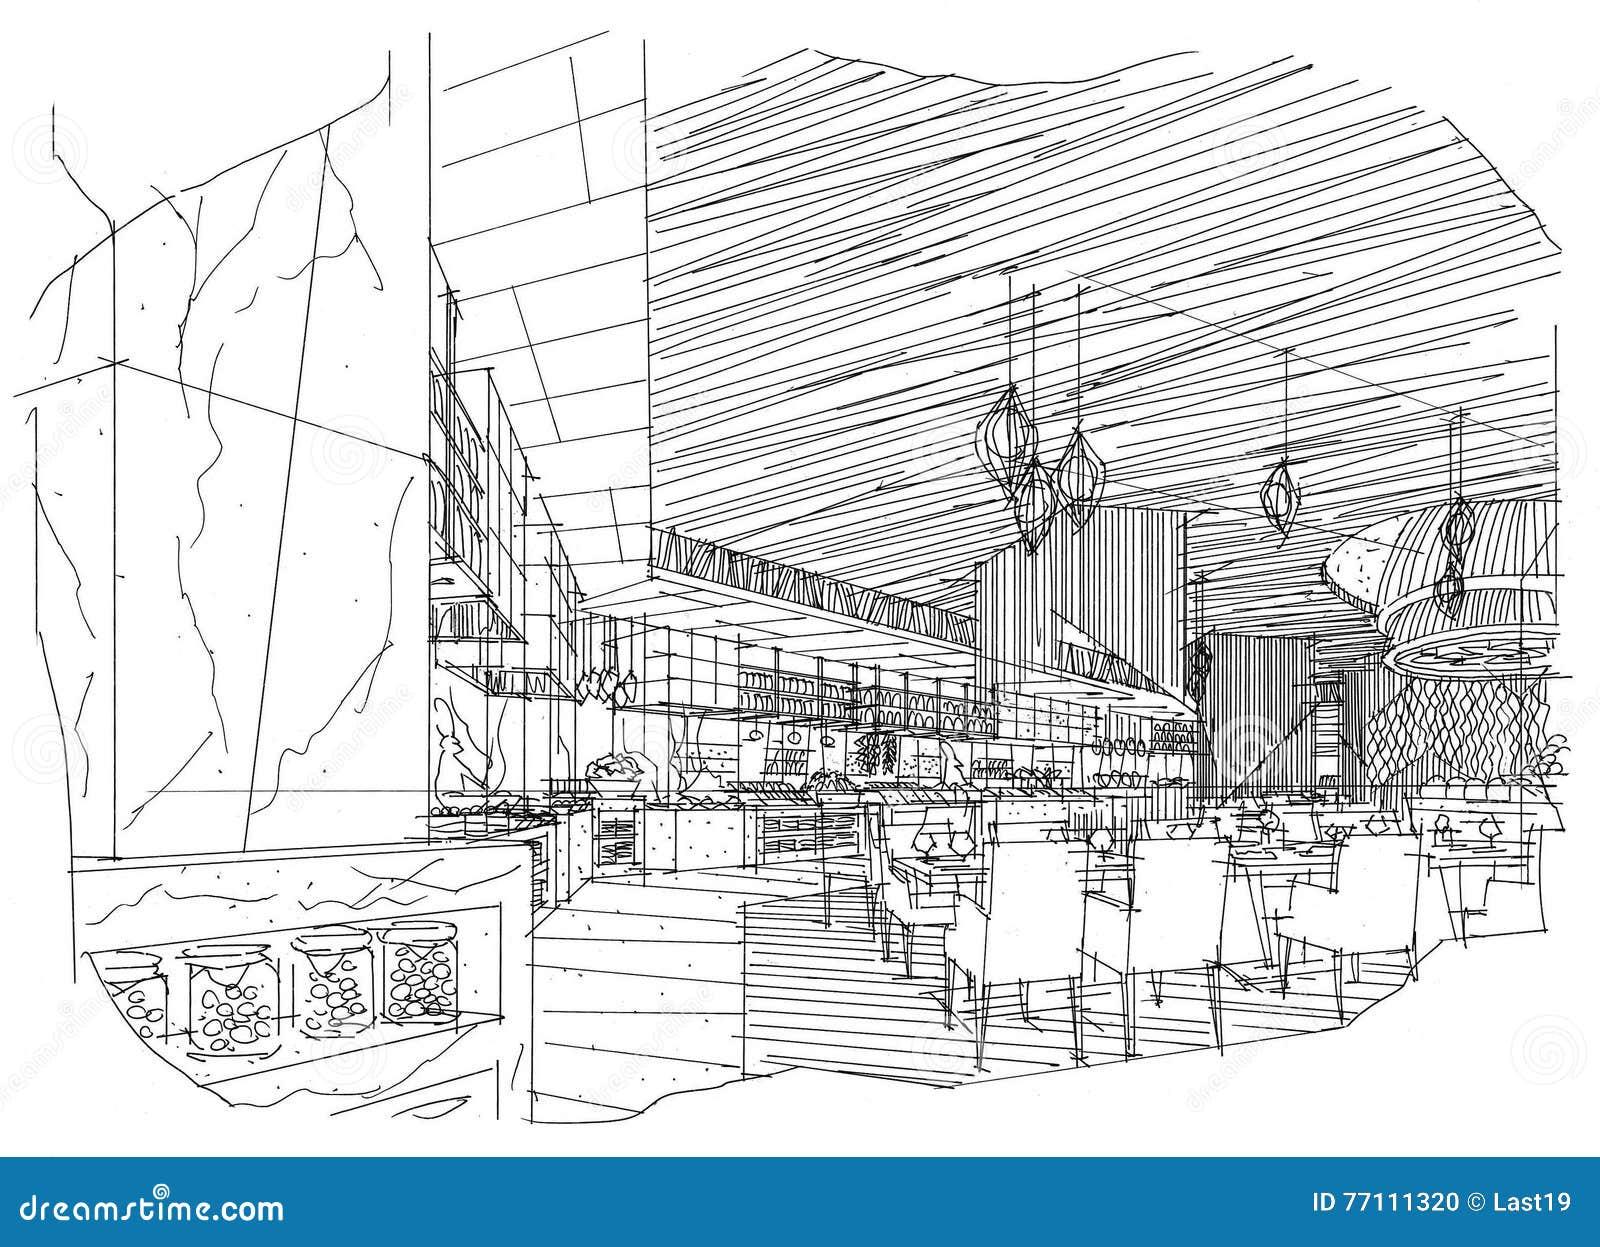 Sketch interior perspective all day restaurant black